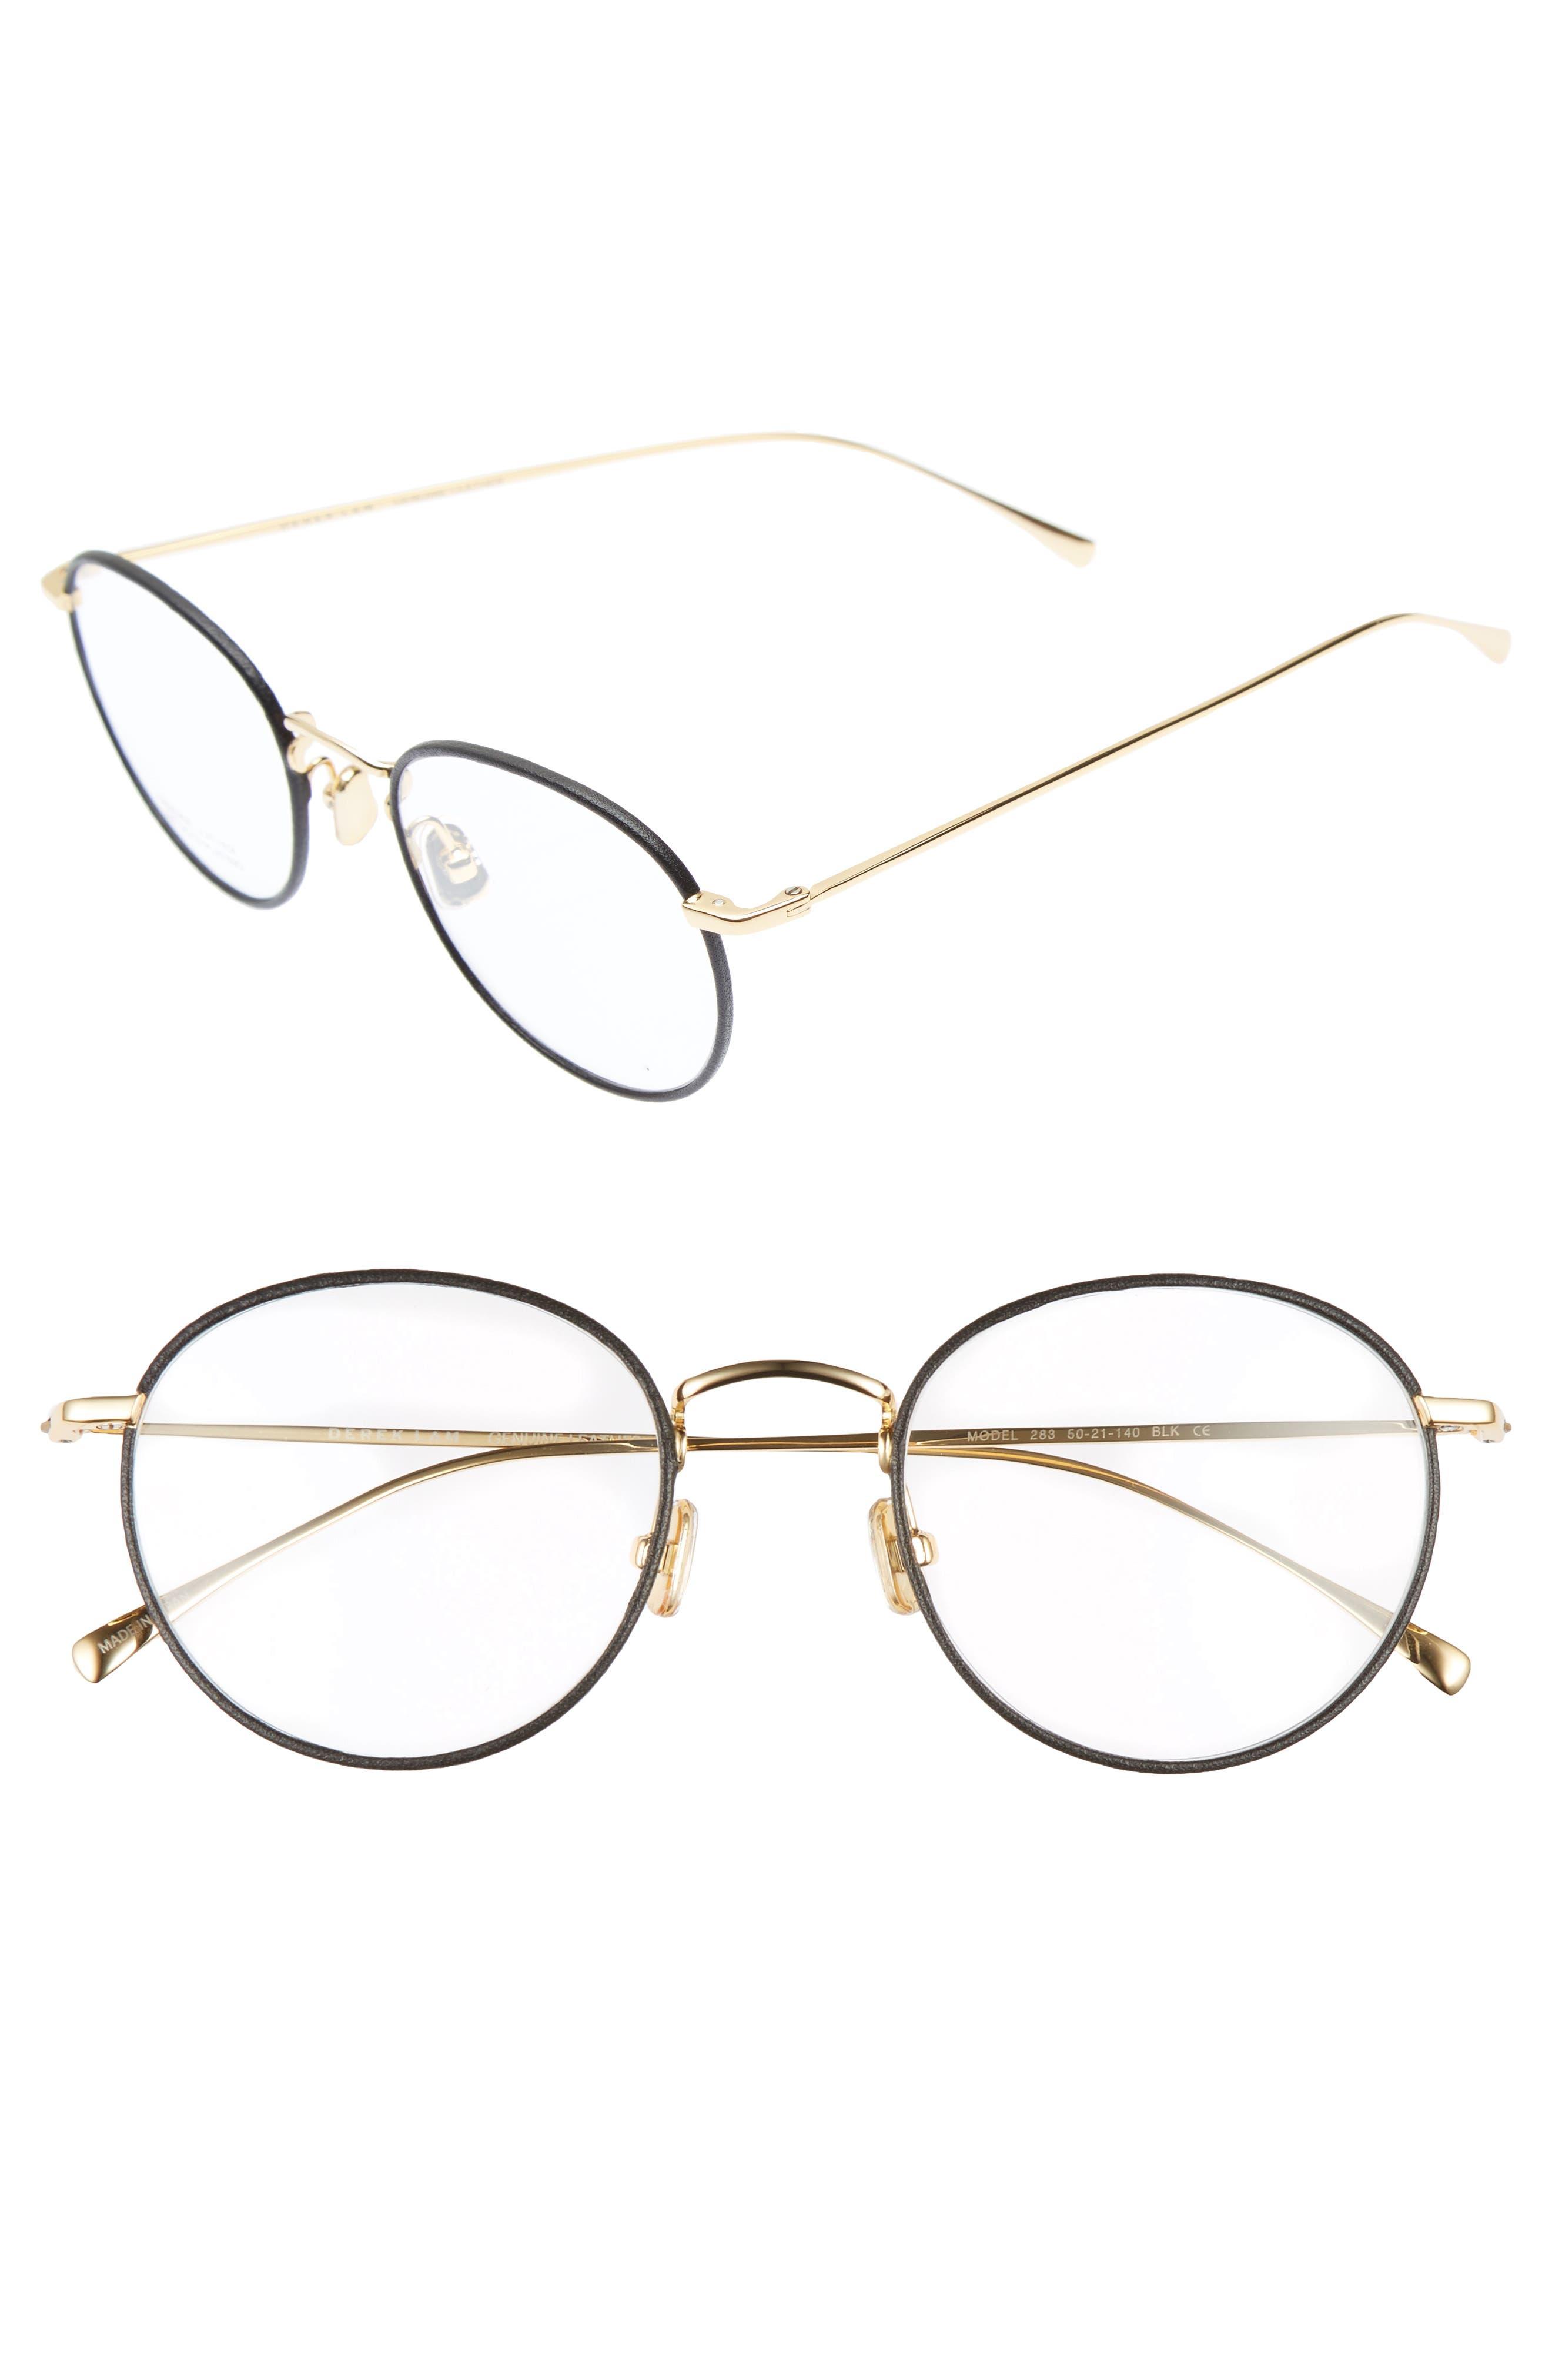 50mm Optical Glasses,                             Main thumbnail 1, color,                             BLACK